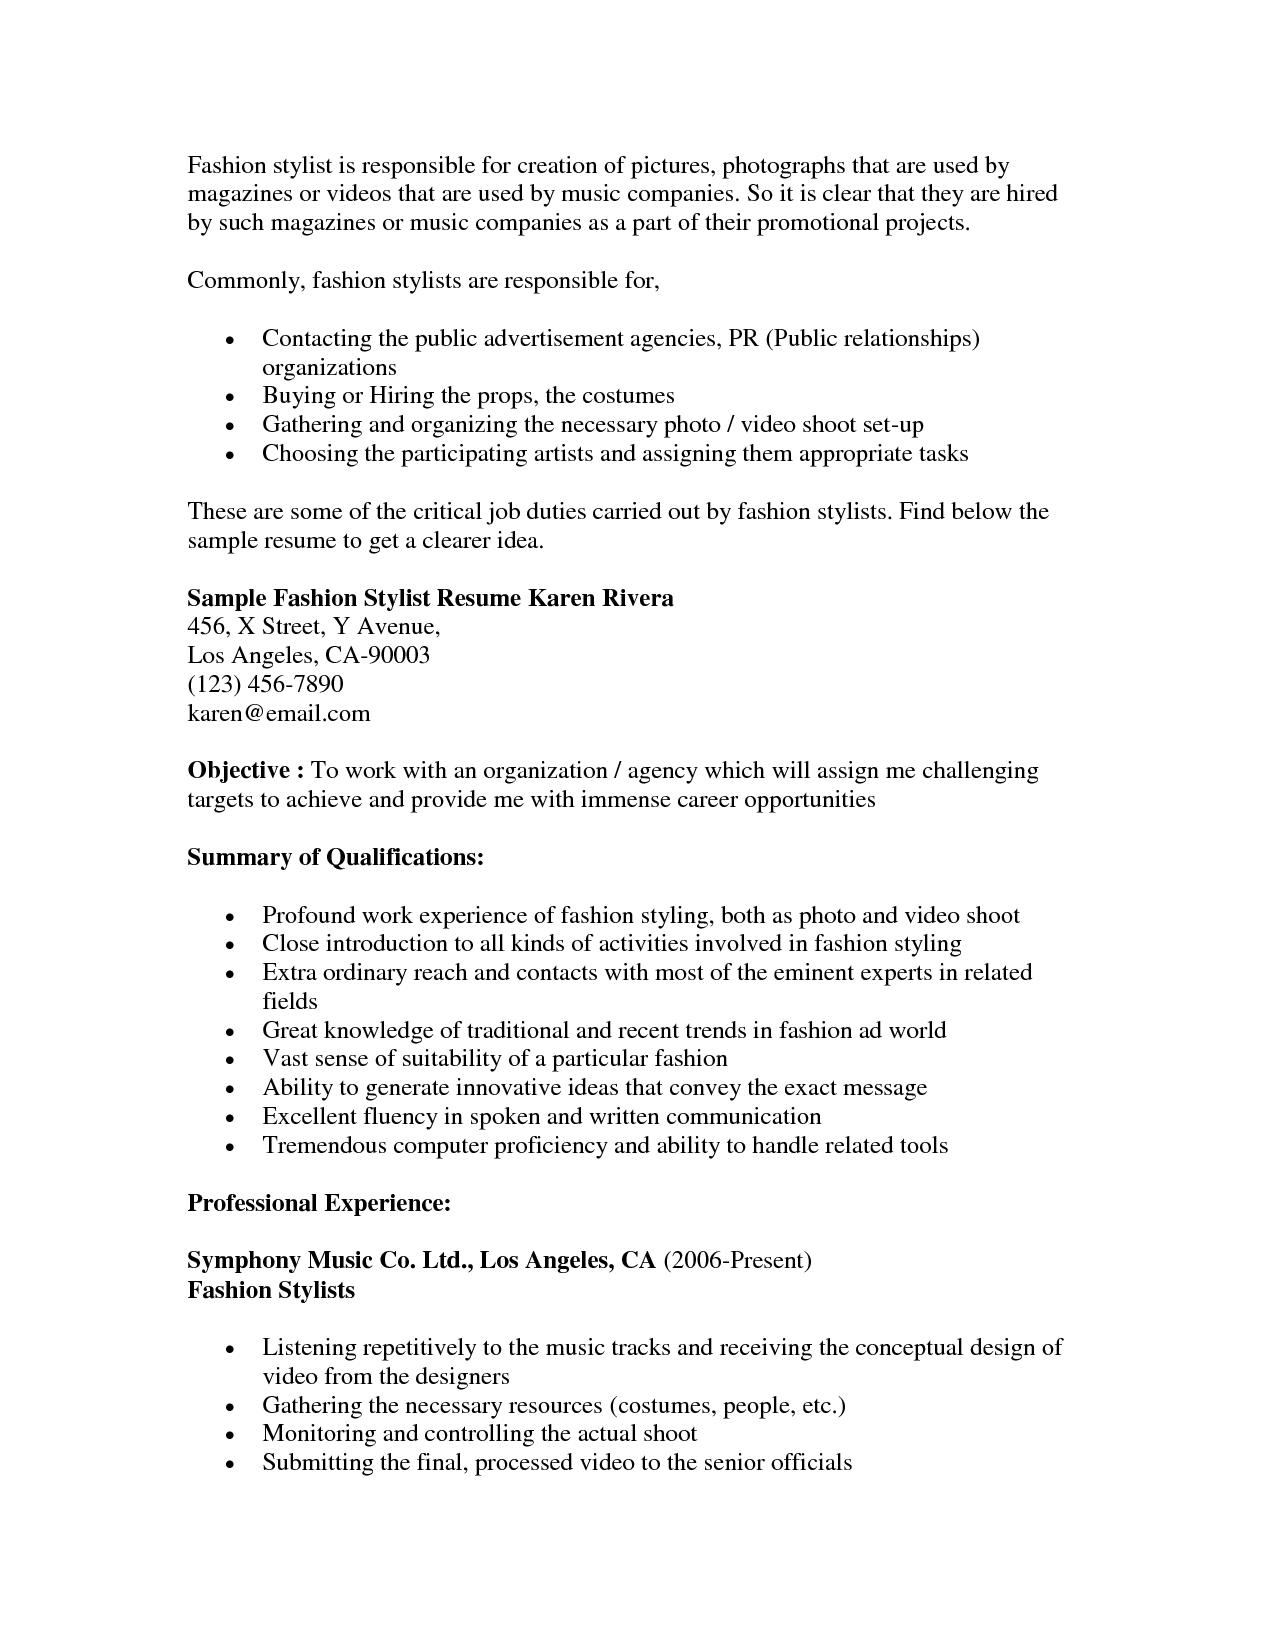 Fashion Stylist Resume Objectivecareer Resume Template Career Resume Template Fashion Stylist Resume Resume Objective Resume Objective Examples